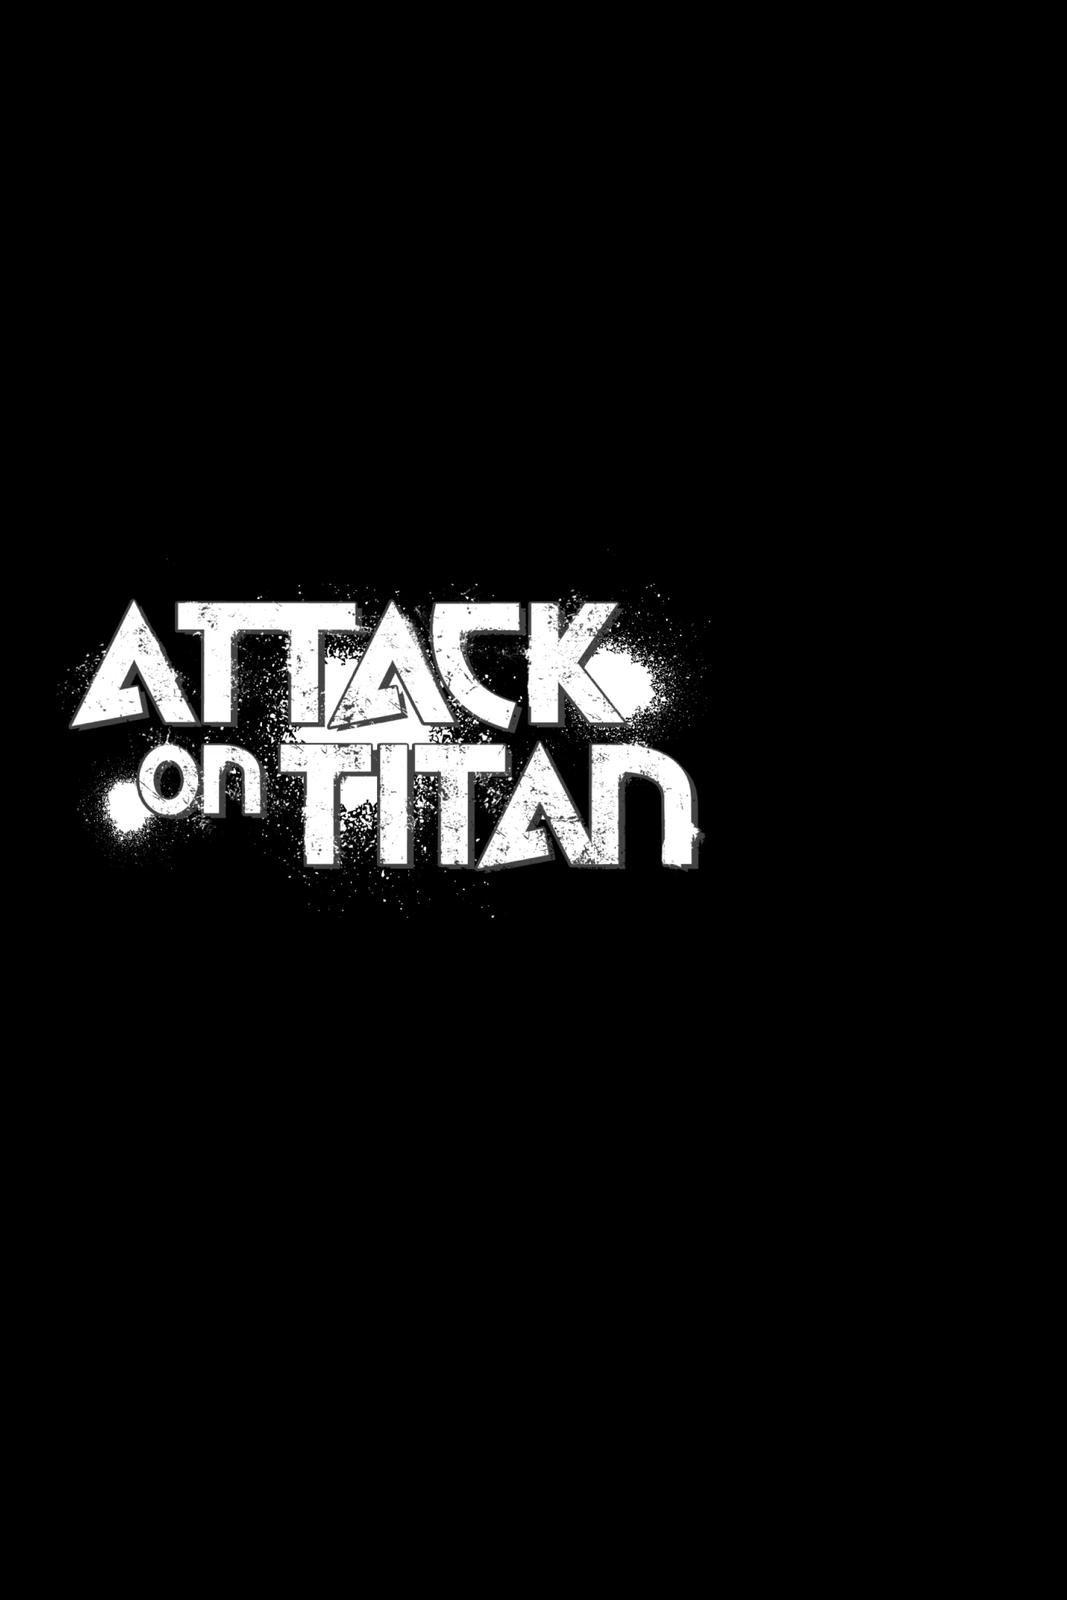 Attack On Titan, Episode 128 image 046